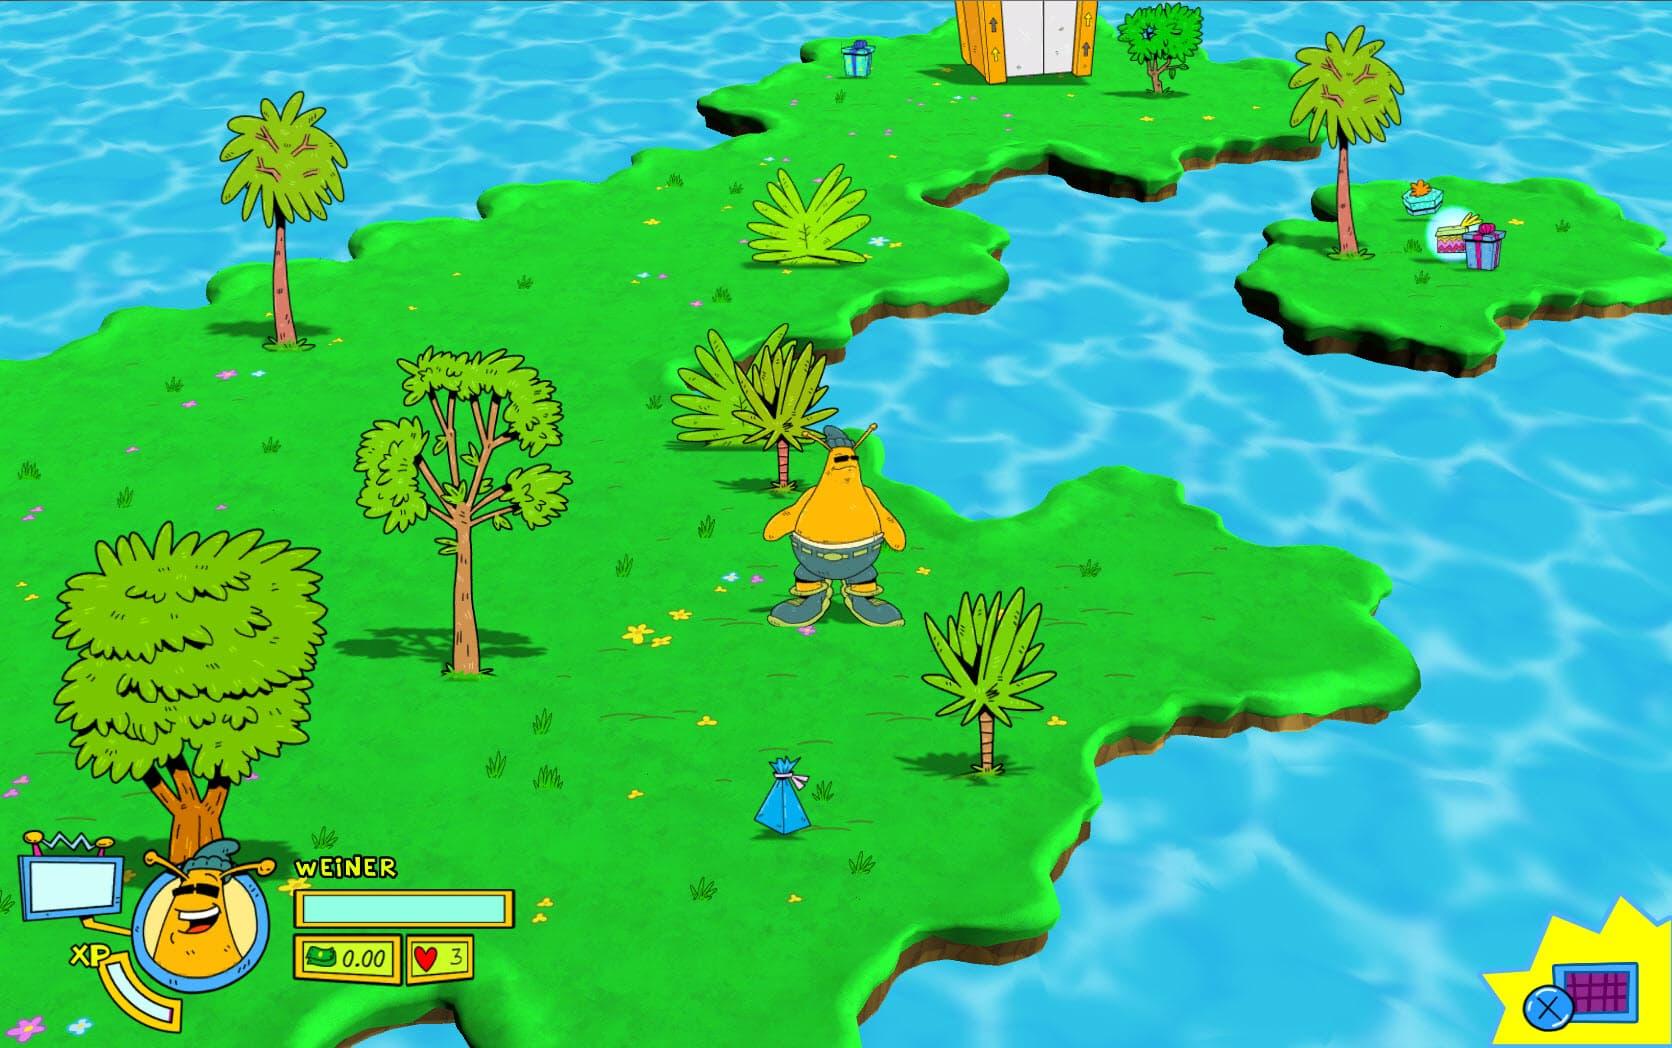 ToeJam & Earl: Back in the Groove Xbox